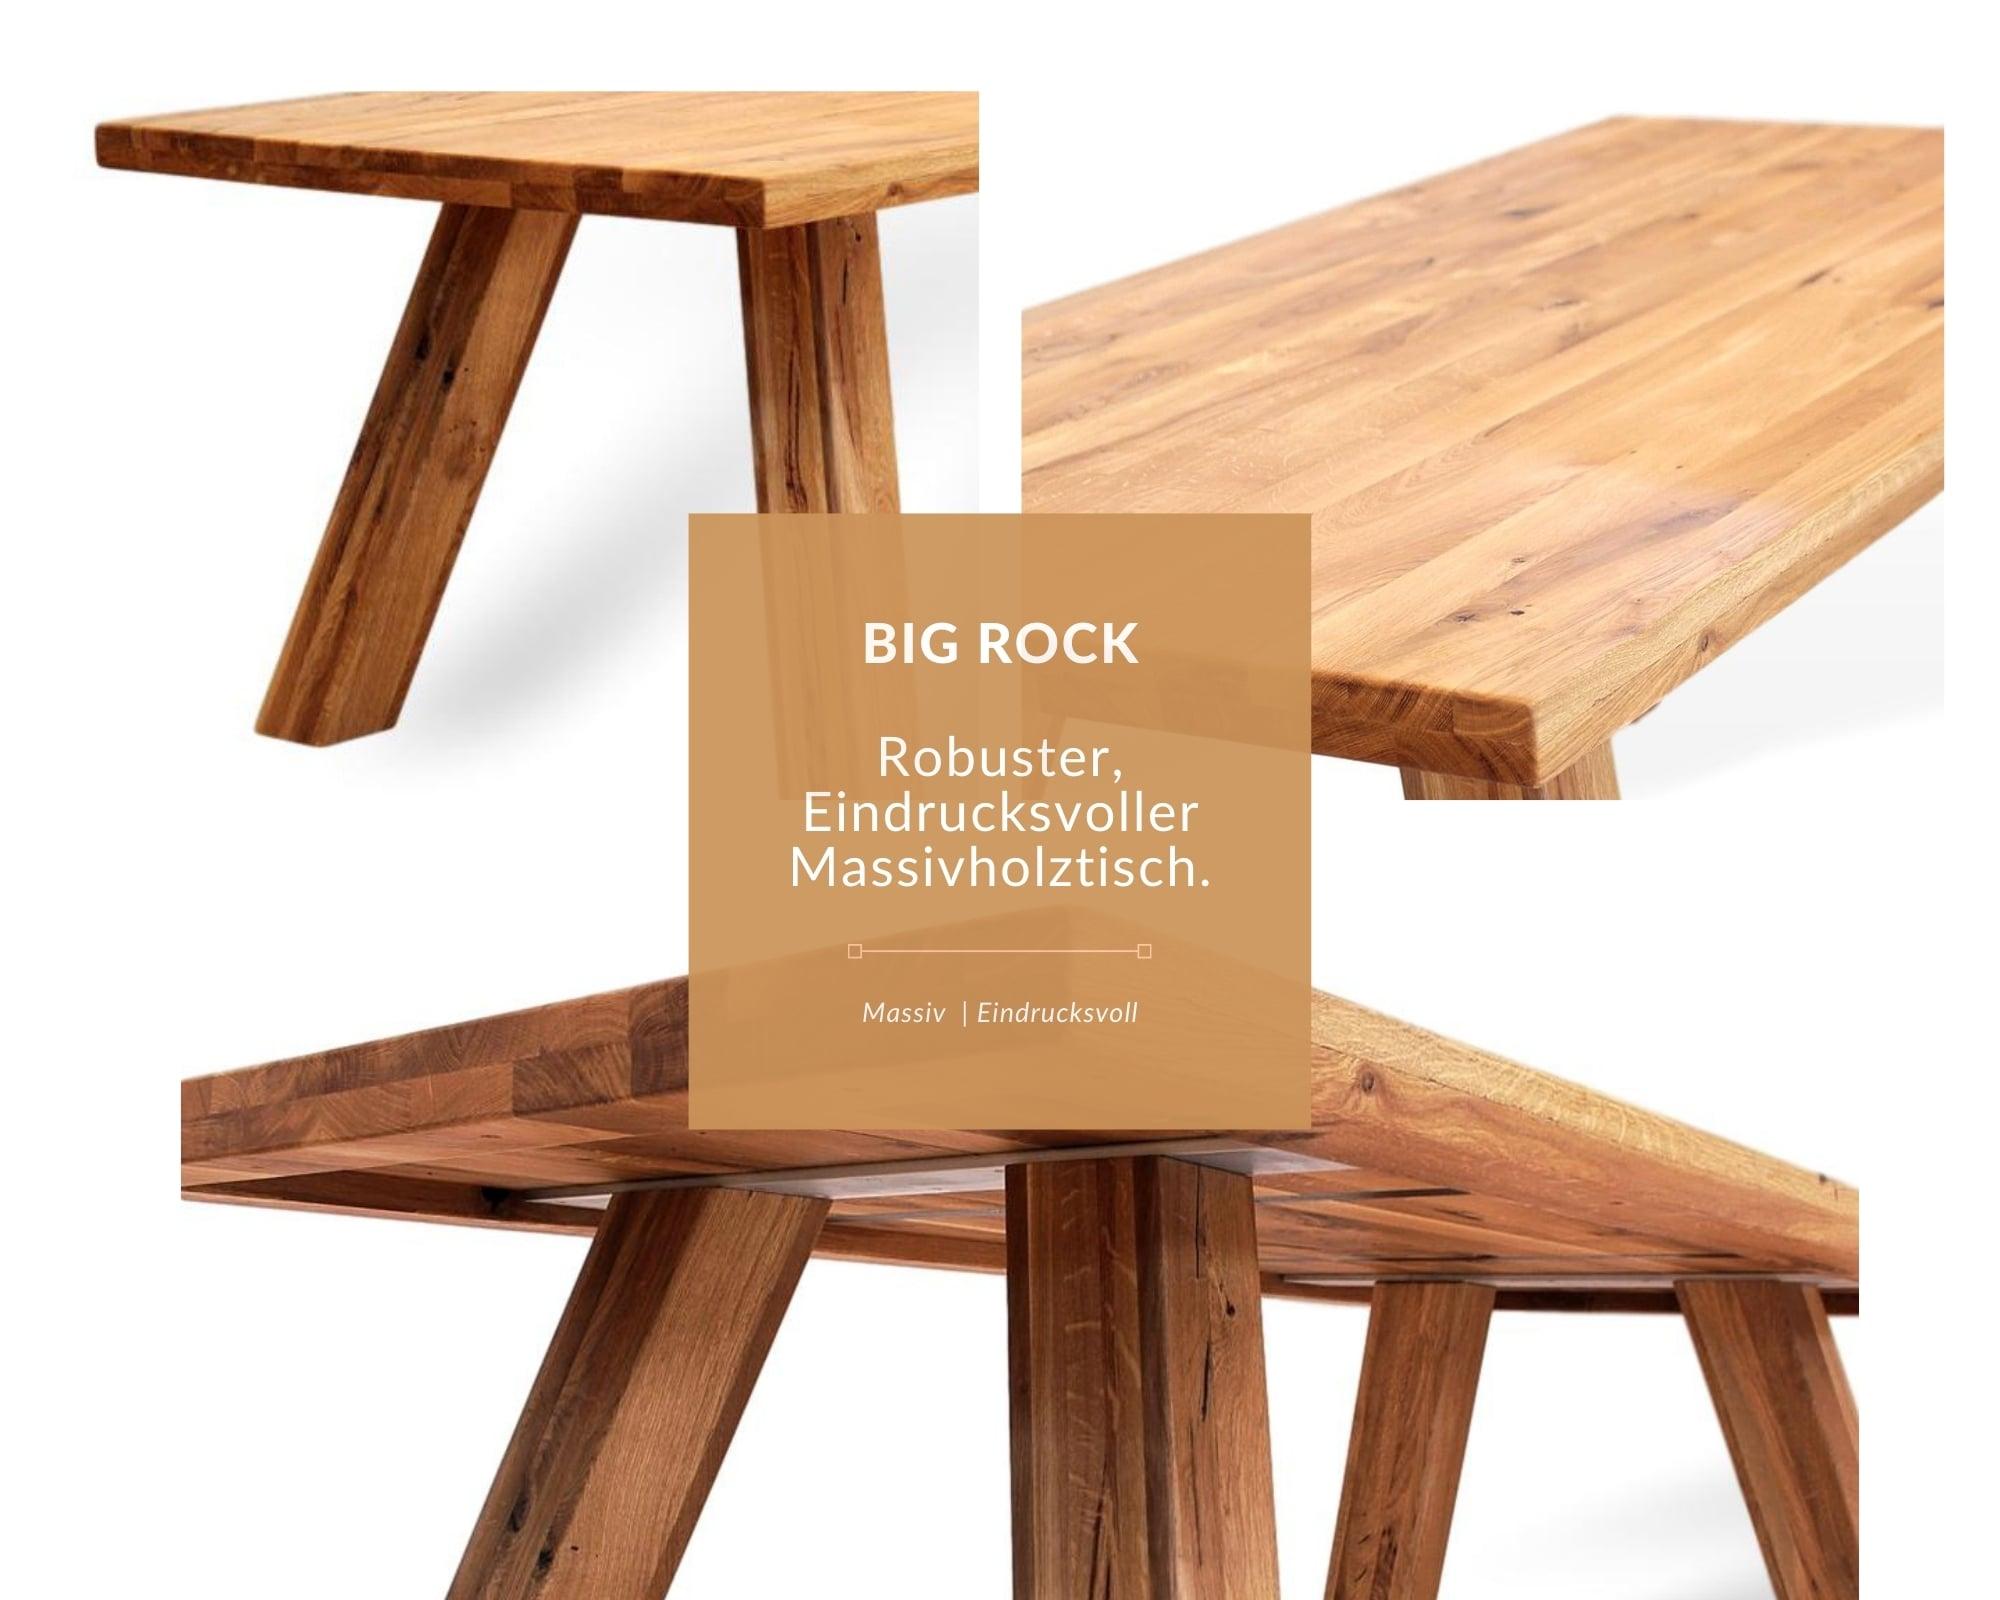 massivholz-esstisch-big-rock-detailfotos